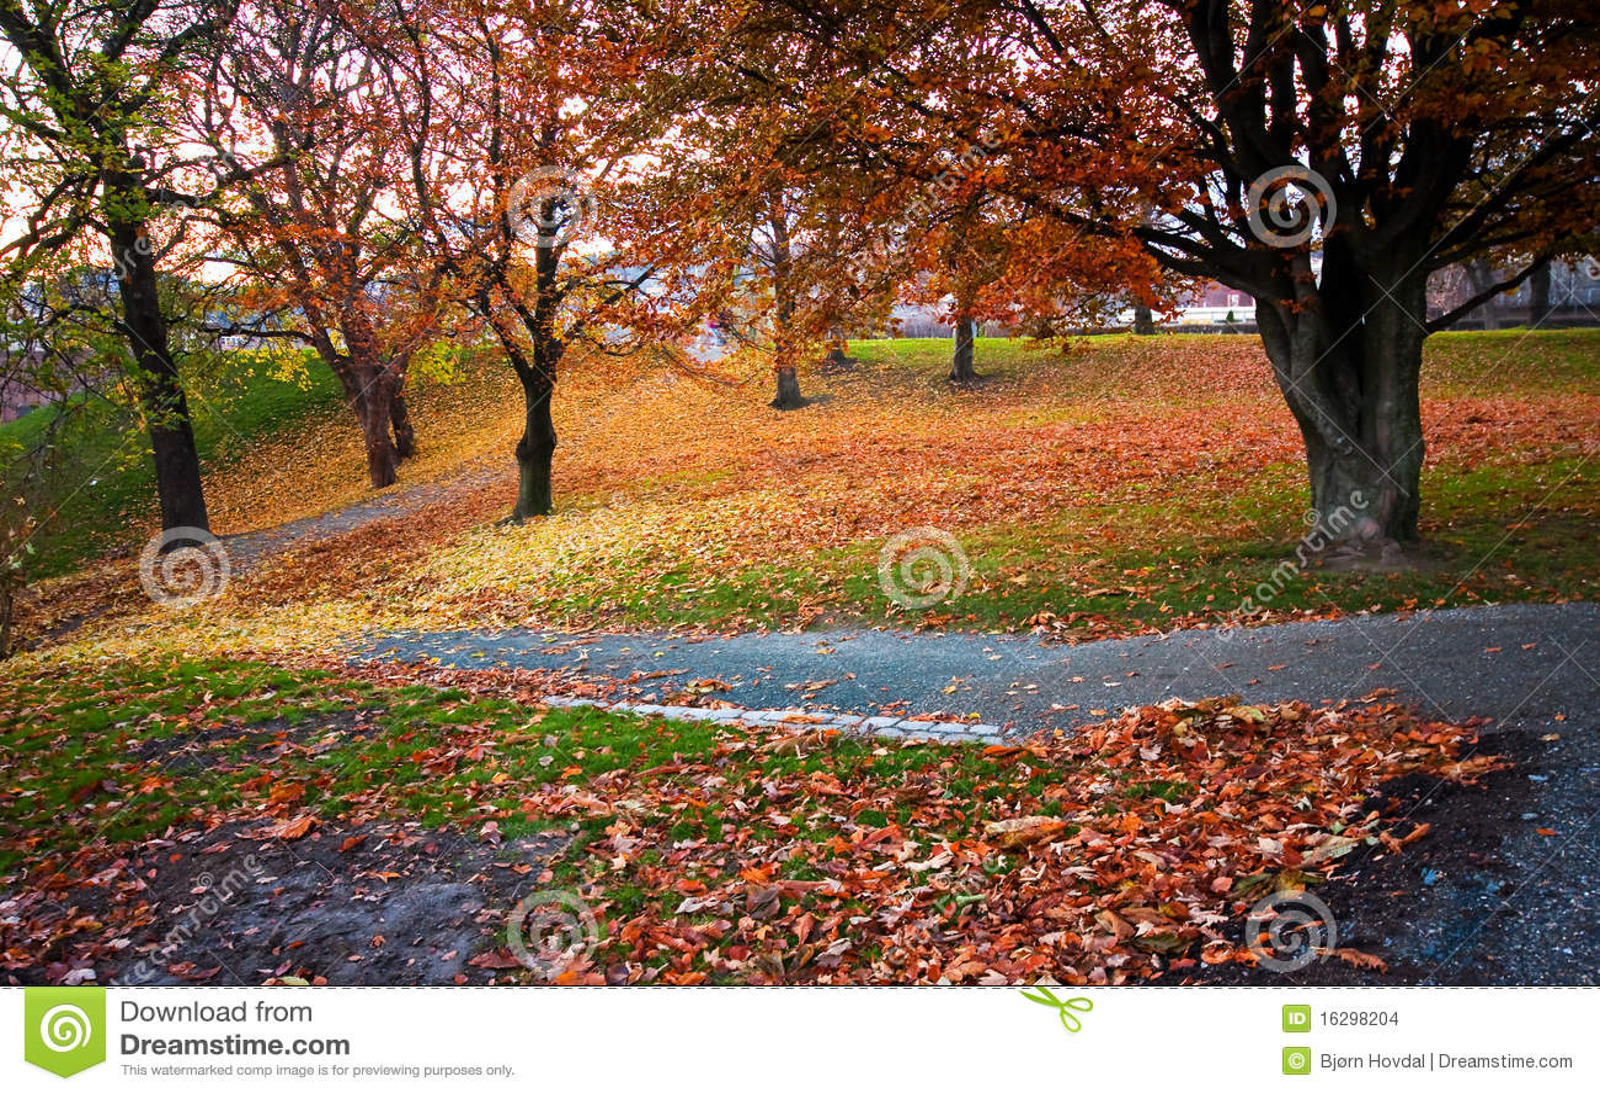 Download πάρκο φθινοπώρου στοκ εικόνες. εικόνα από δέντρο, πορτοκάλι - 16298204